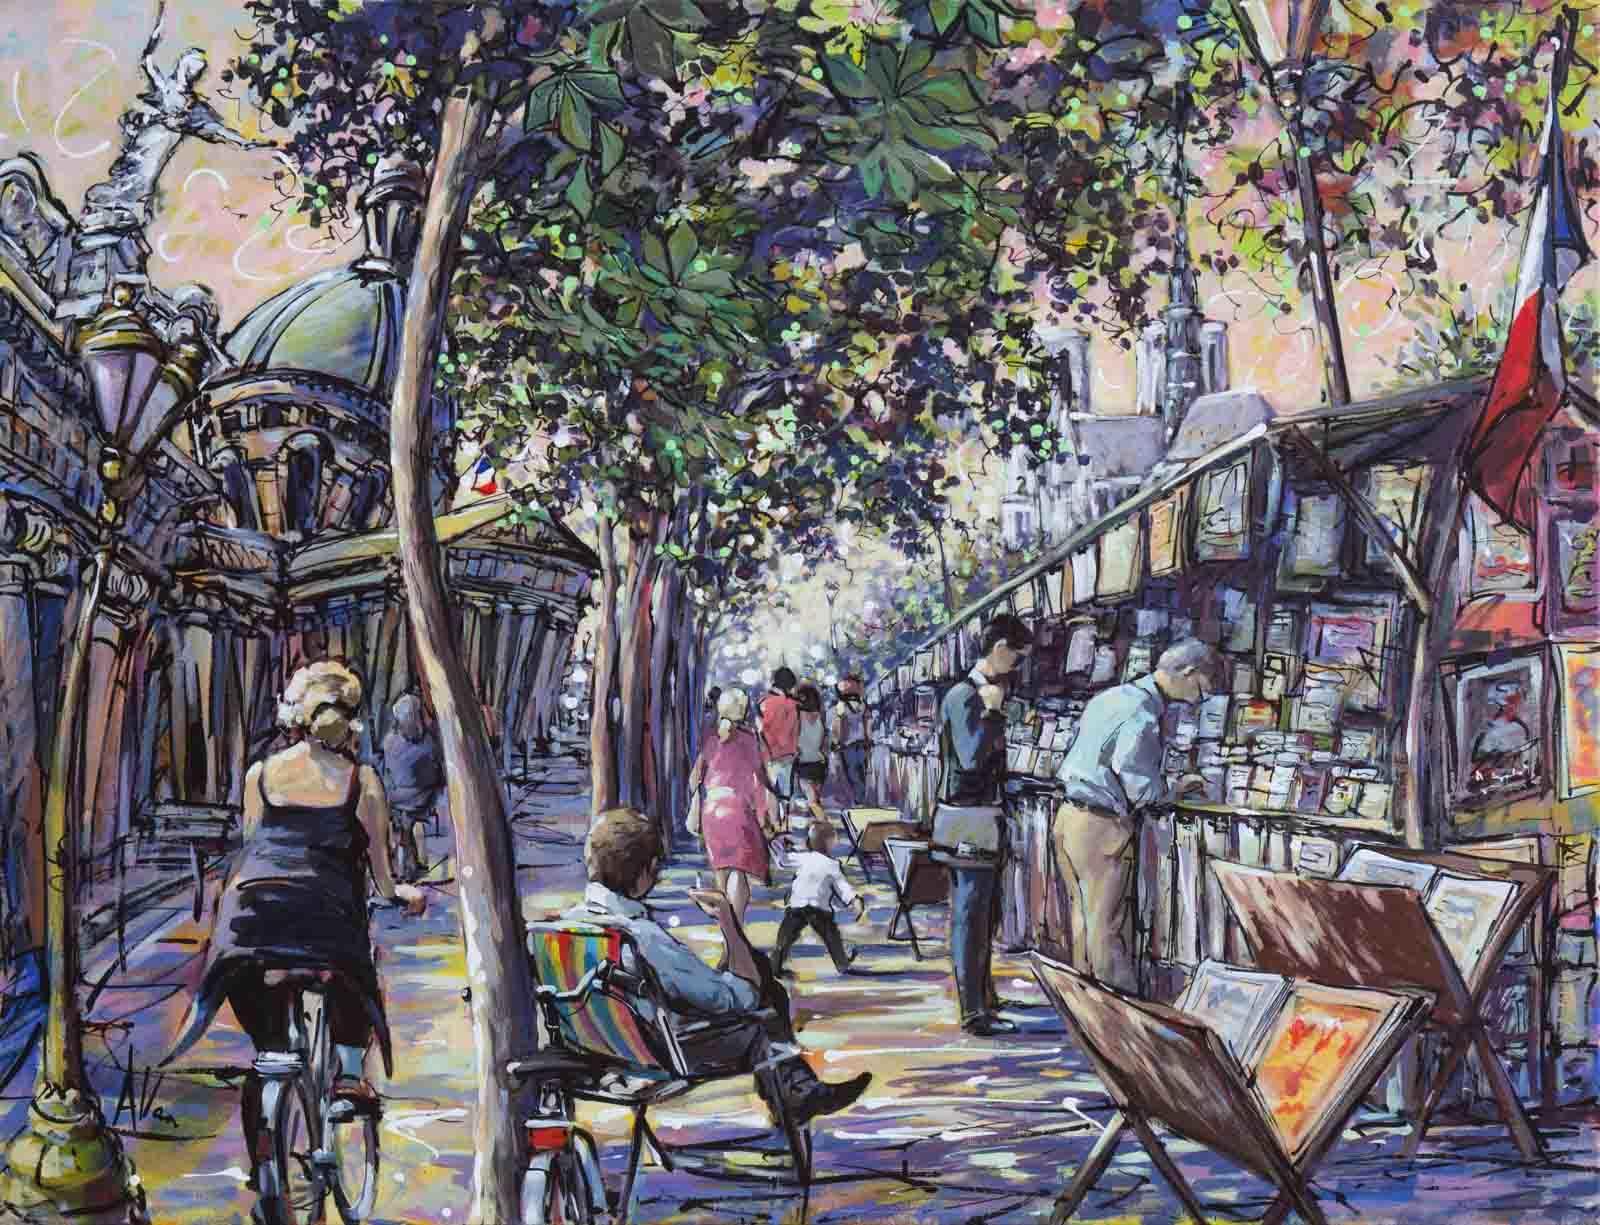 Rive Gauche Paris